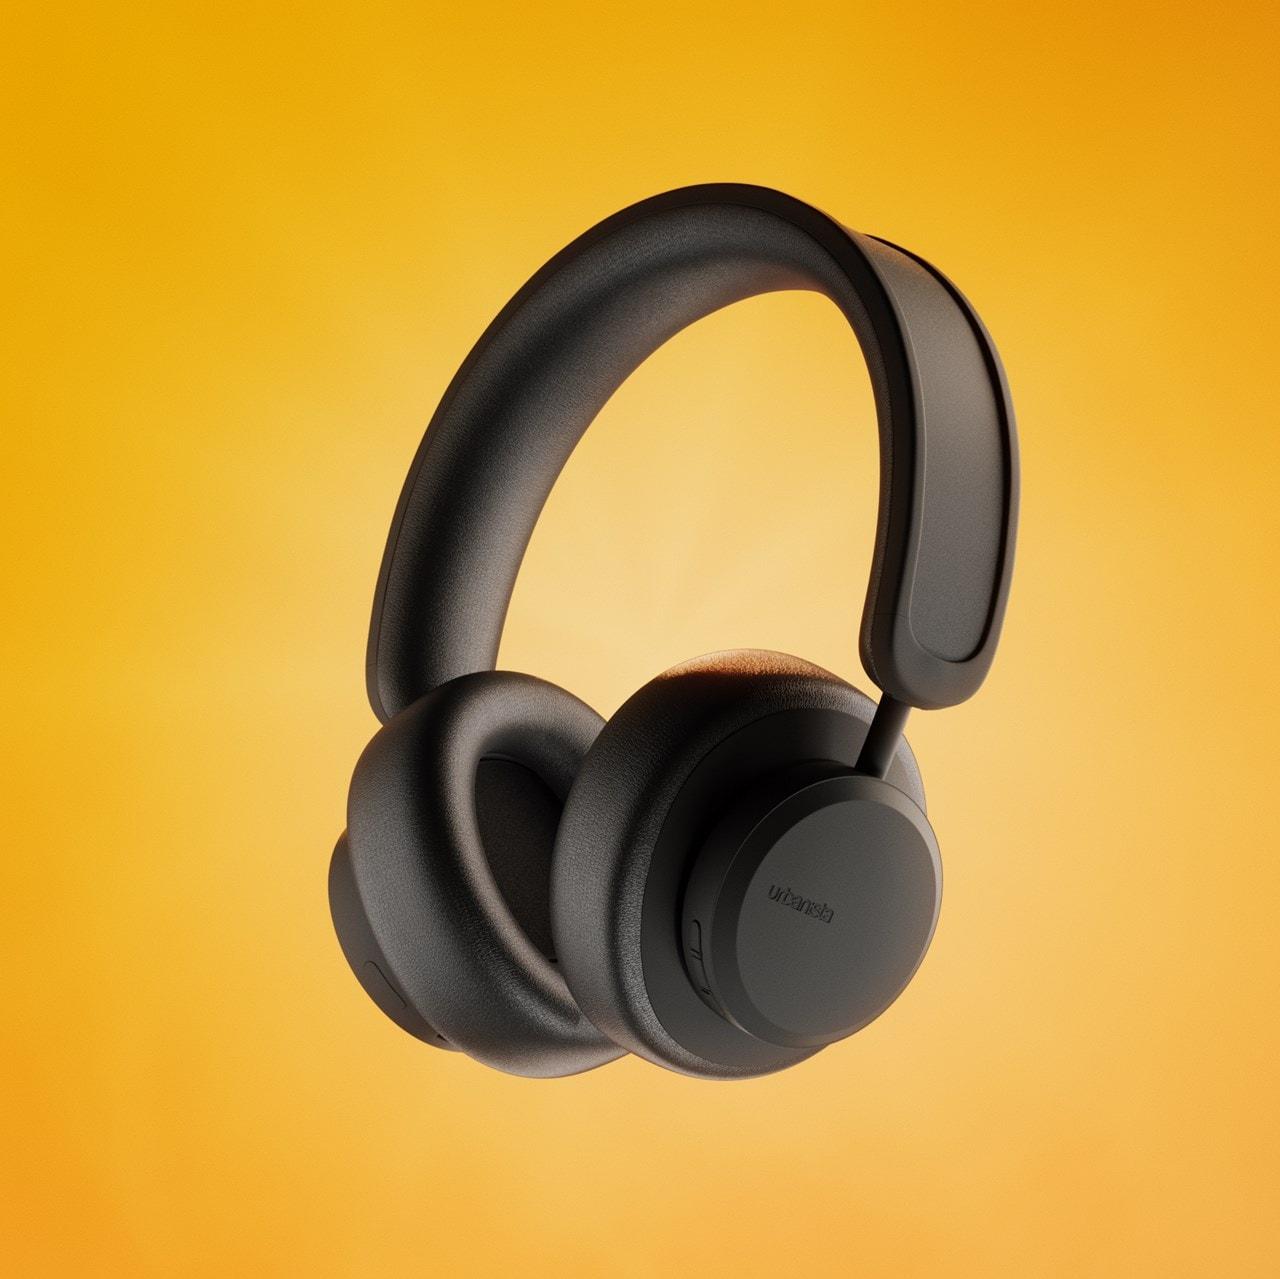 Urbanista Los Angeles Midnight Black Solar Powered Active Noise Cancelling Bluetooth Headphones - 4